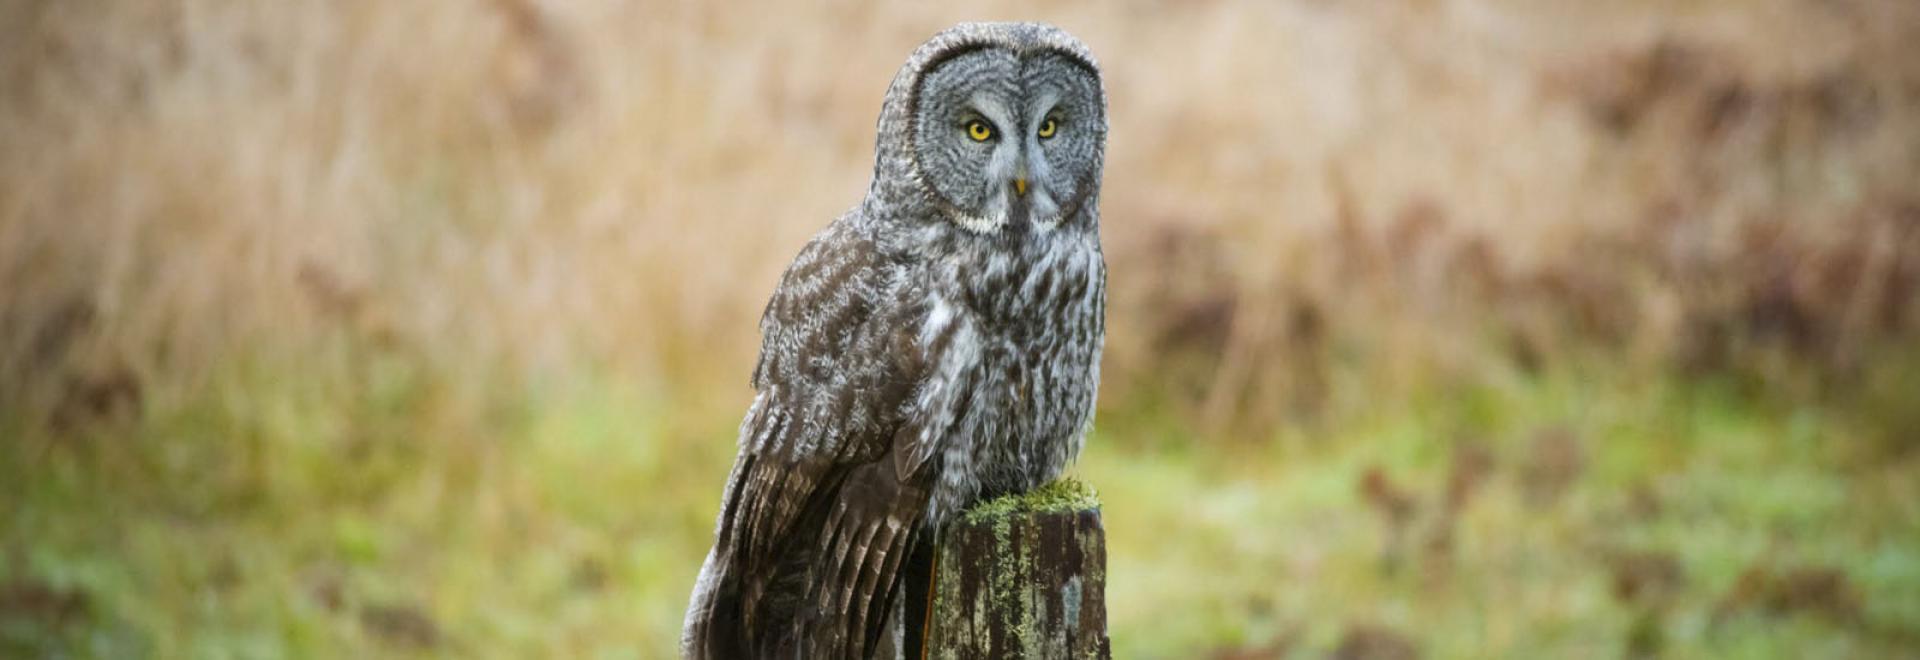 Great Grey owl visiting Prairie Creek Redwoods State Park